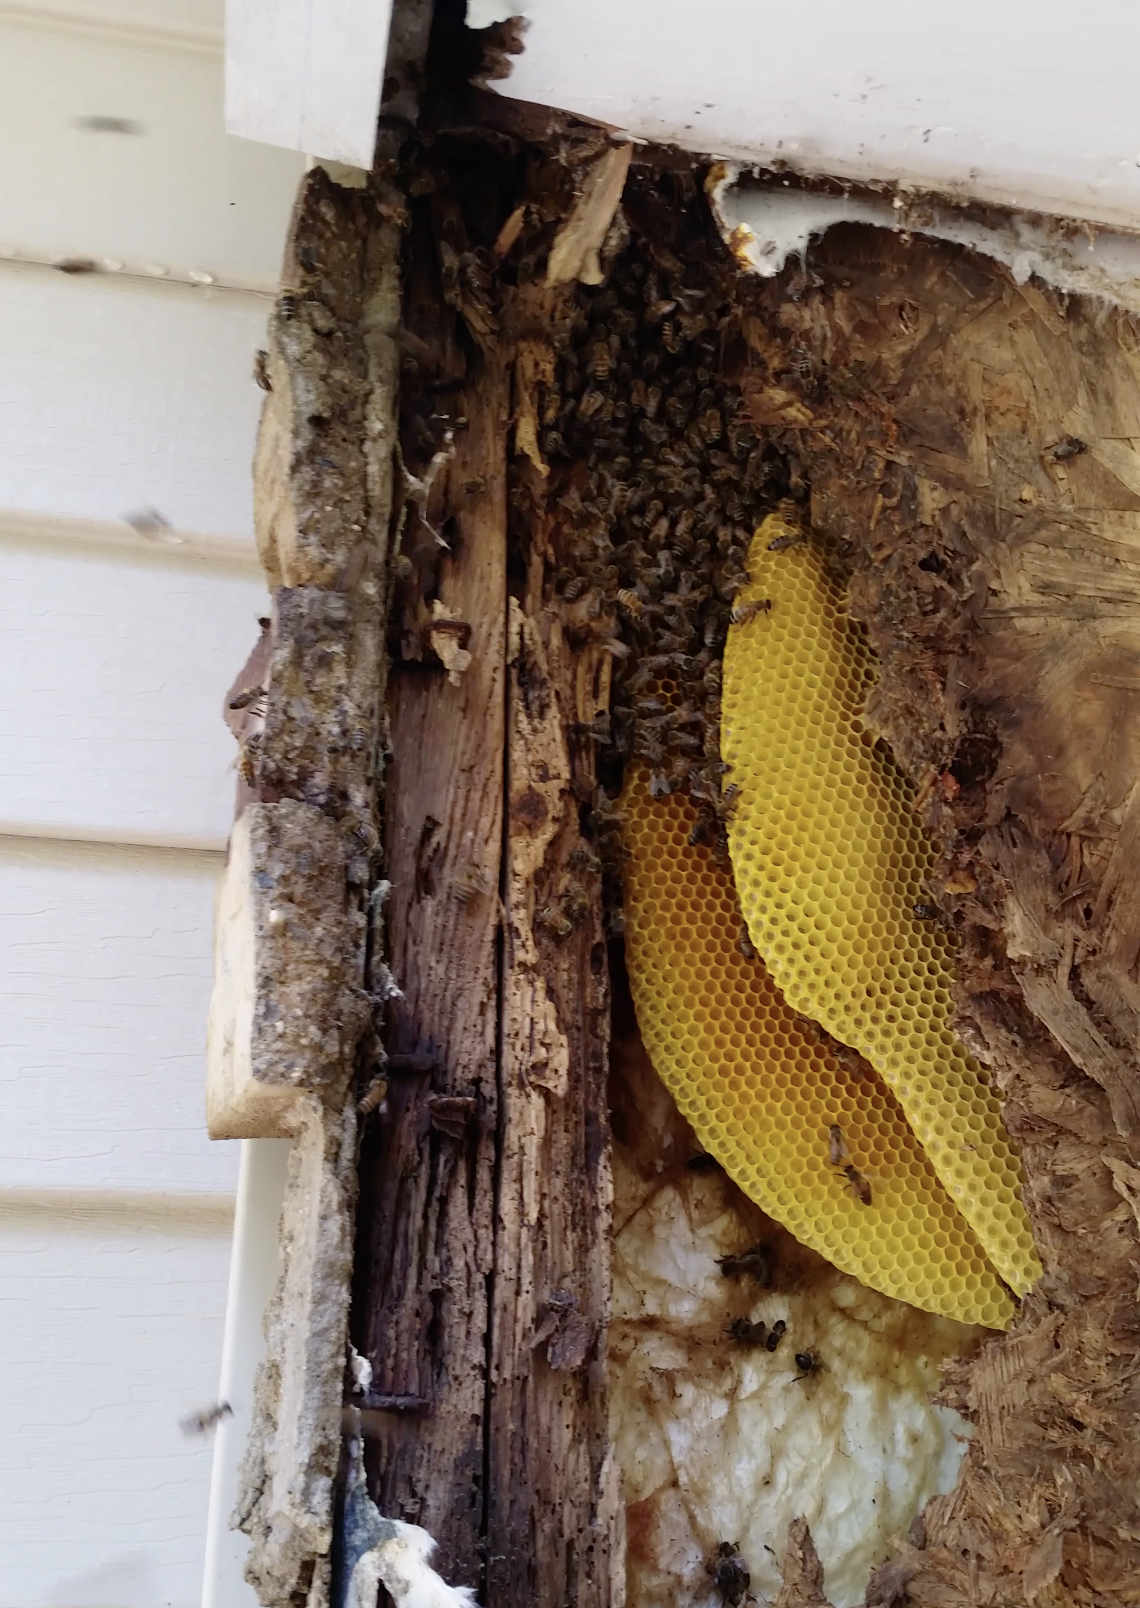 structural-exterior-swarm.jpg